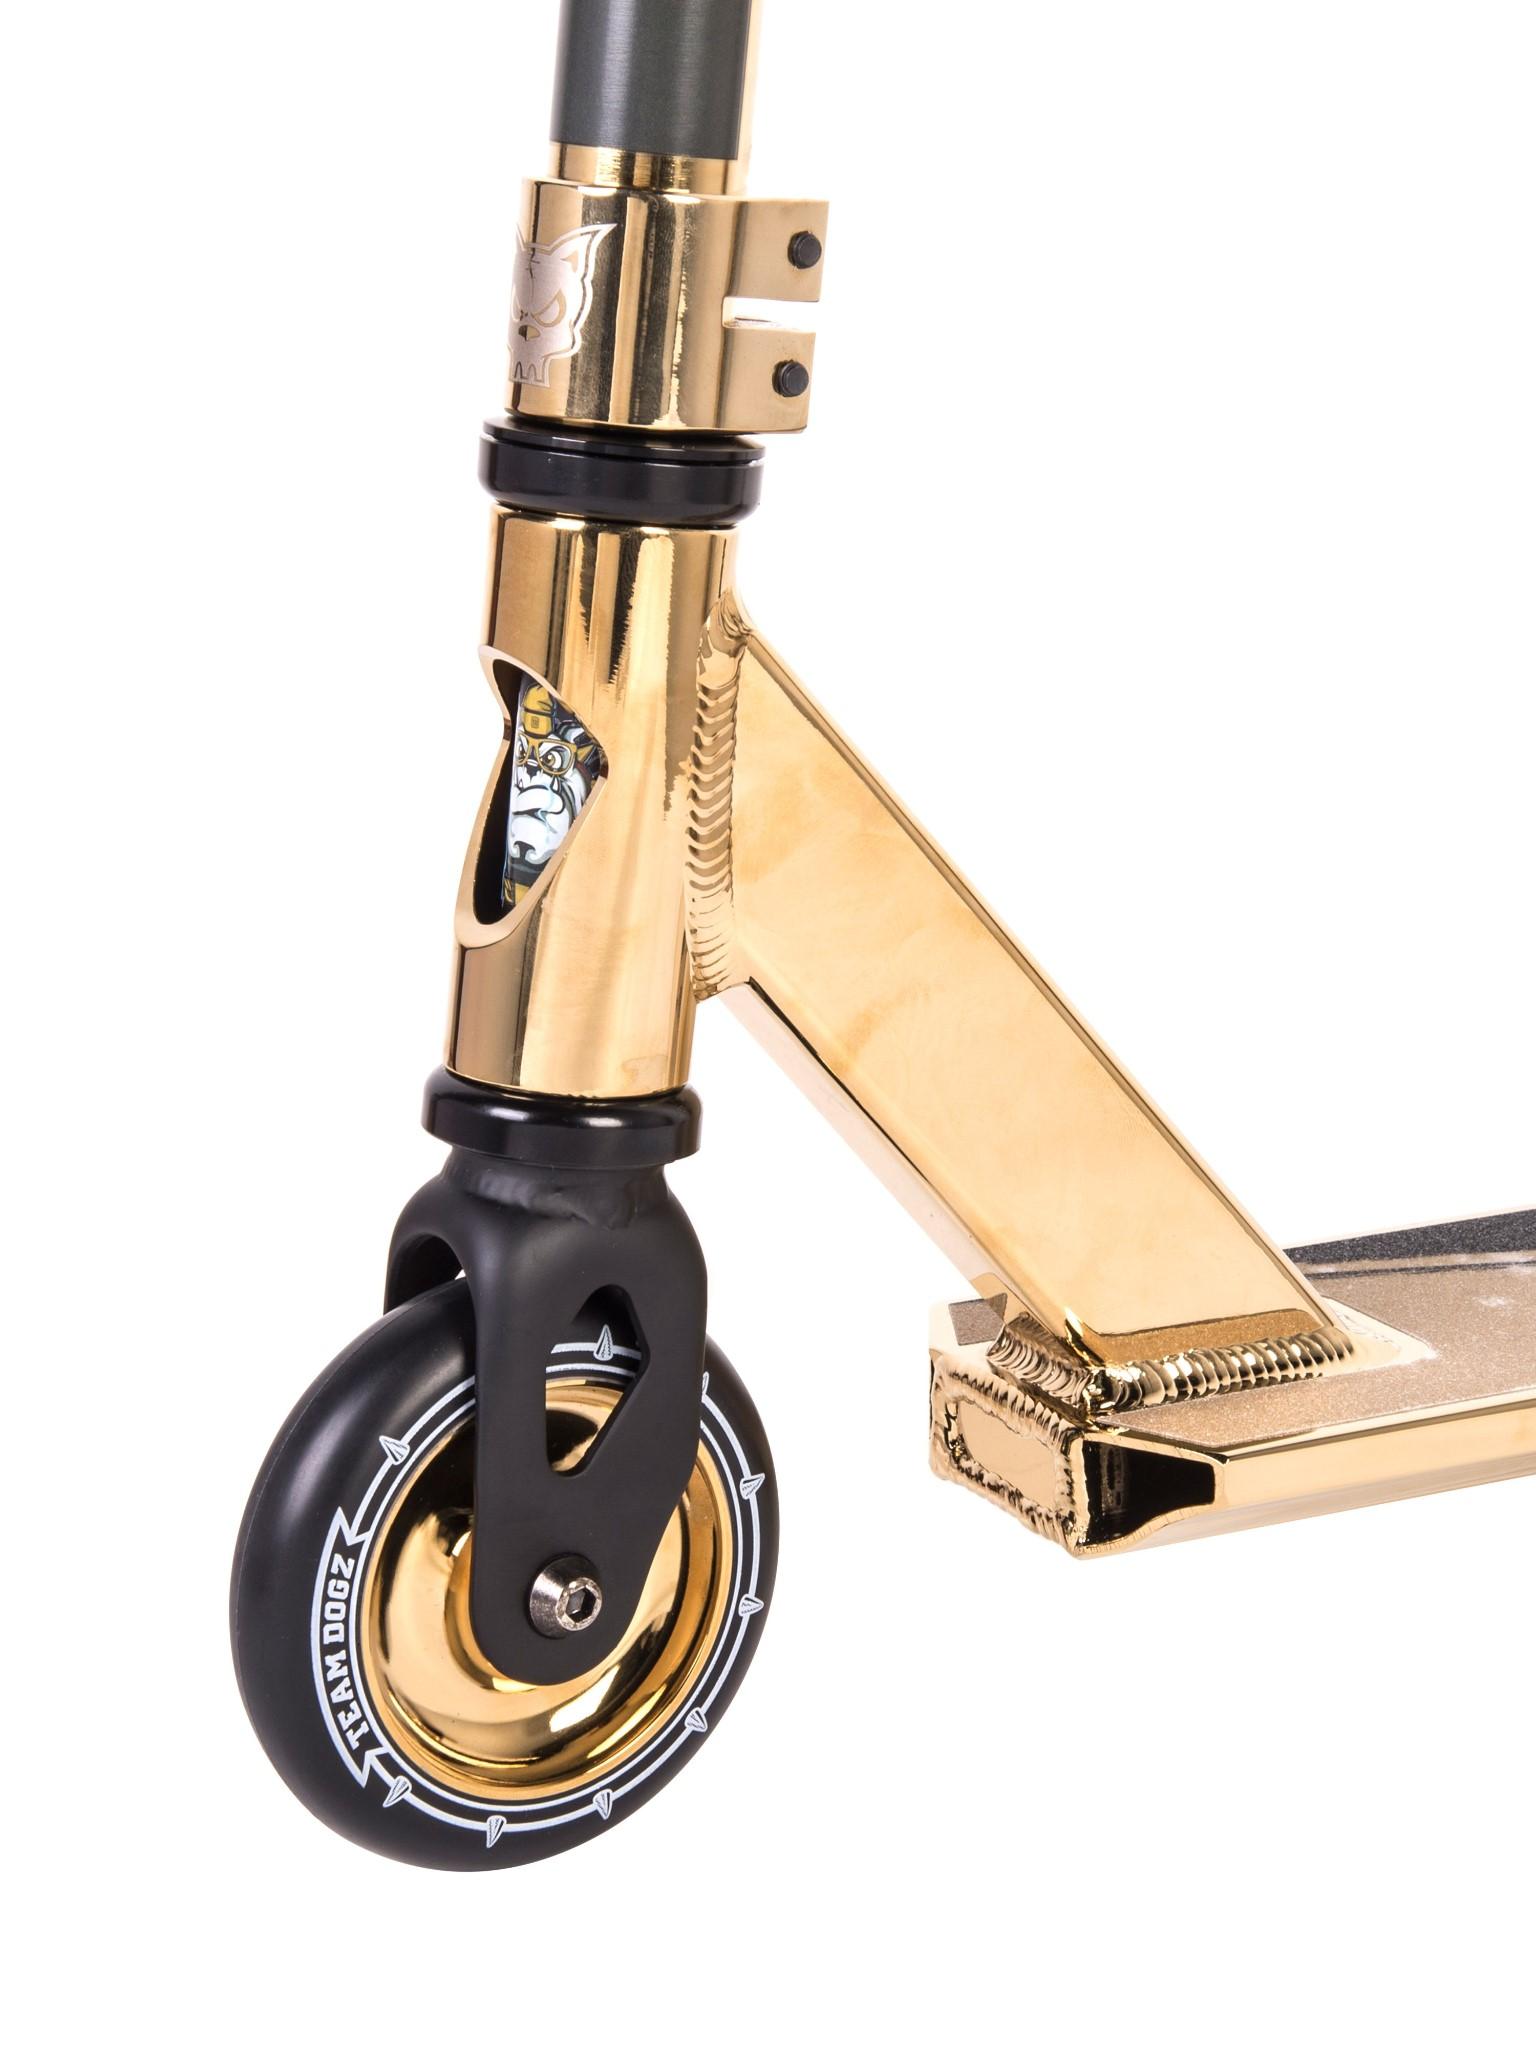 Team Dogz Pro X Chrome Gold Stunt Scooter